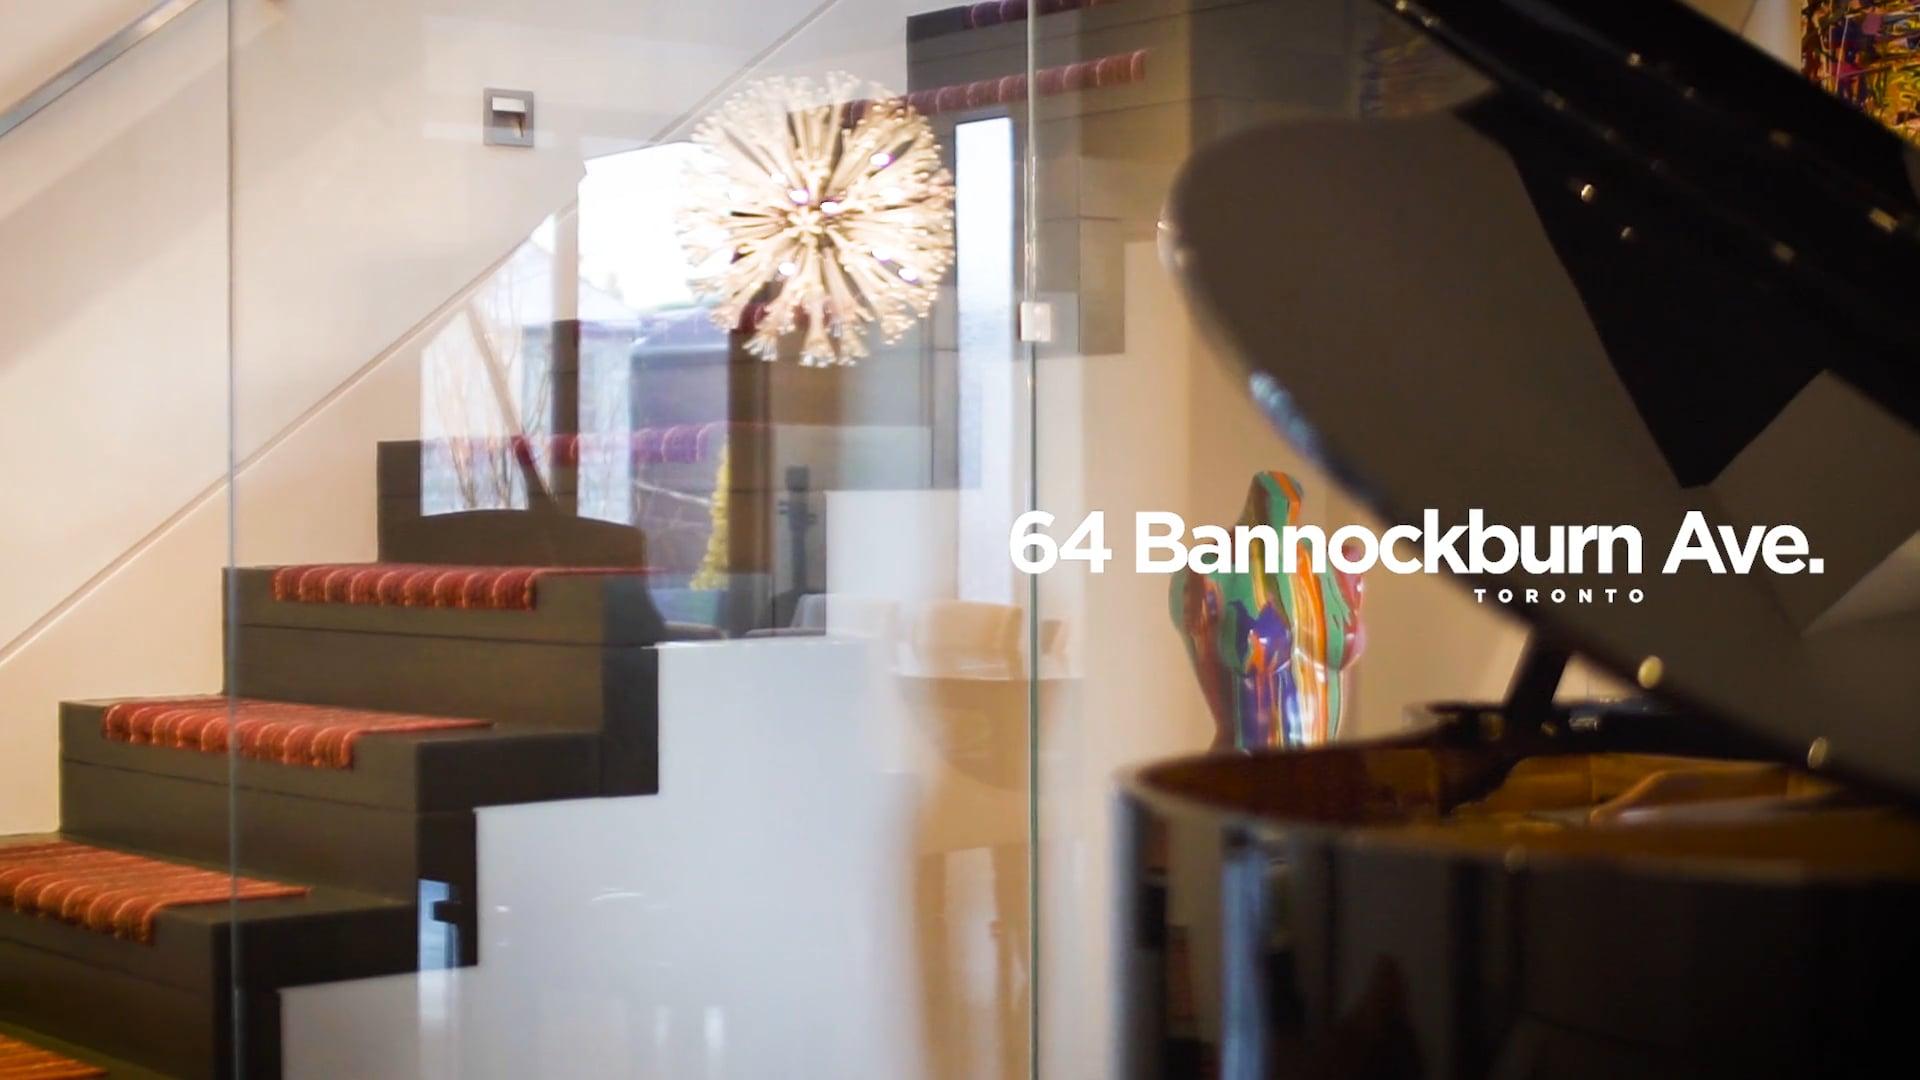 64 Bannockburn Ave